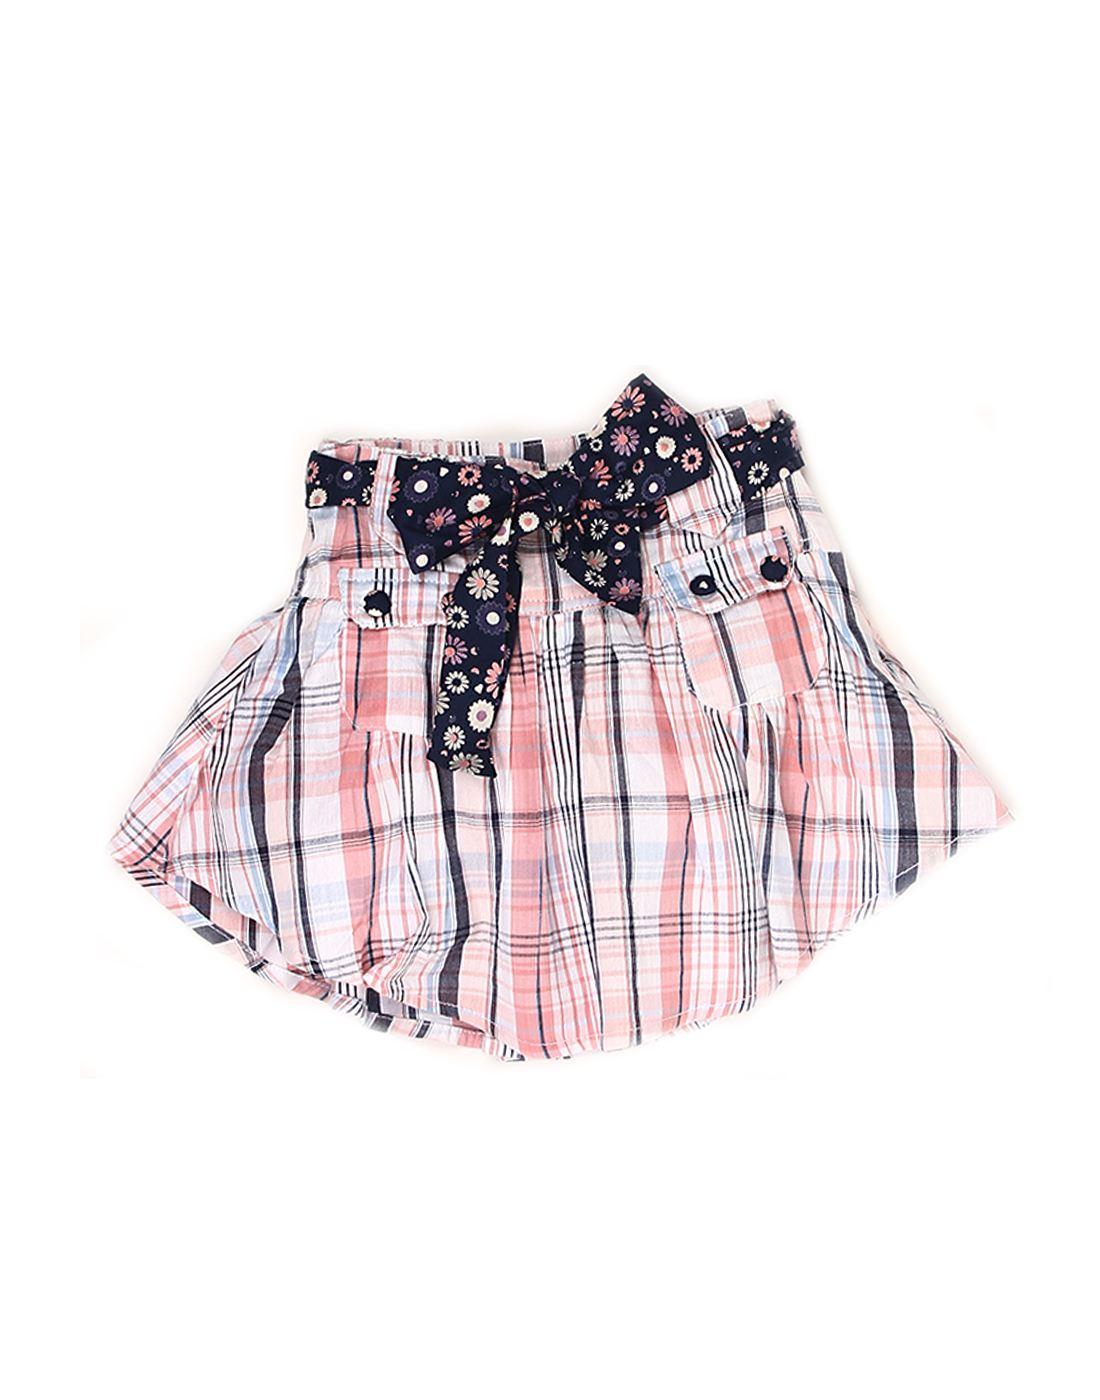 K.C.O 89 Girls Casual Checkered  Skirt